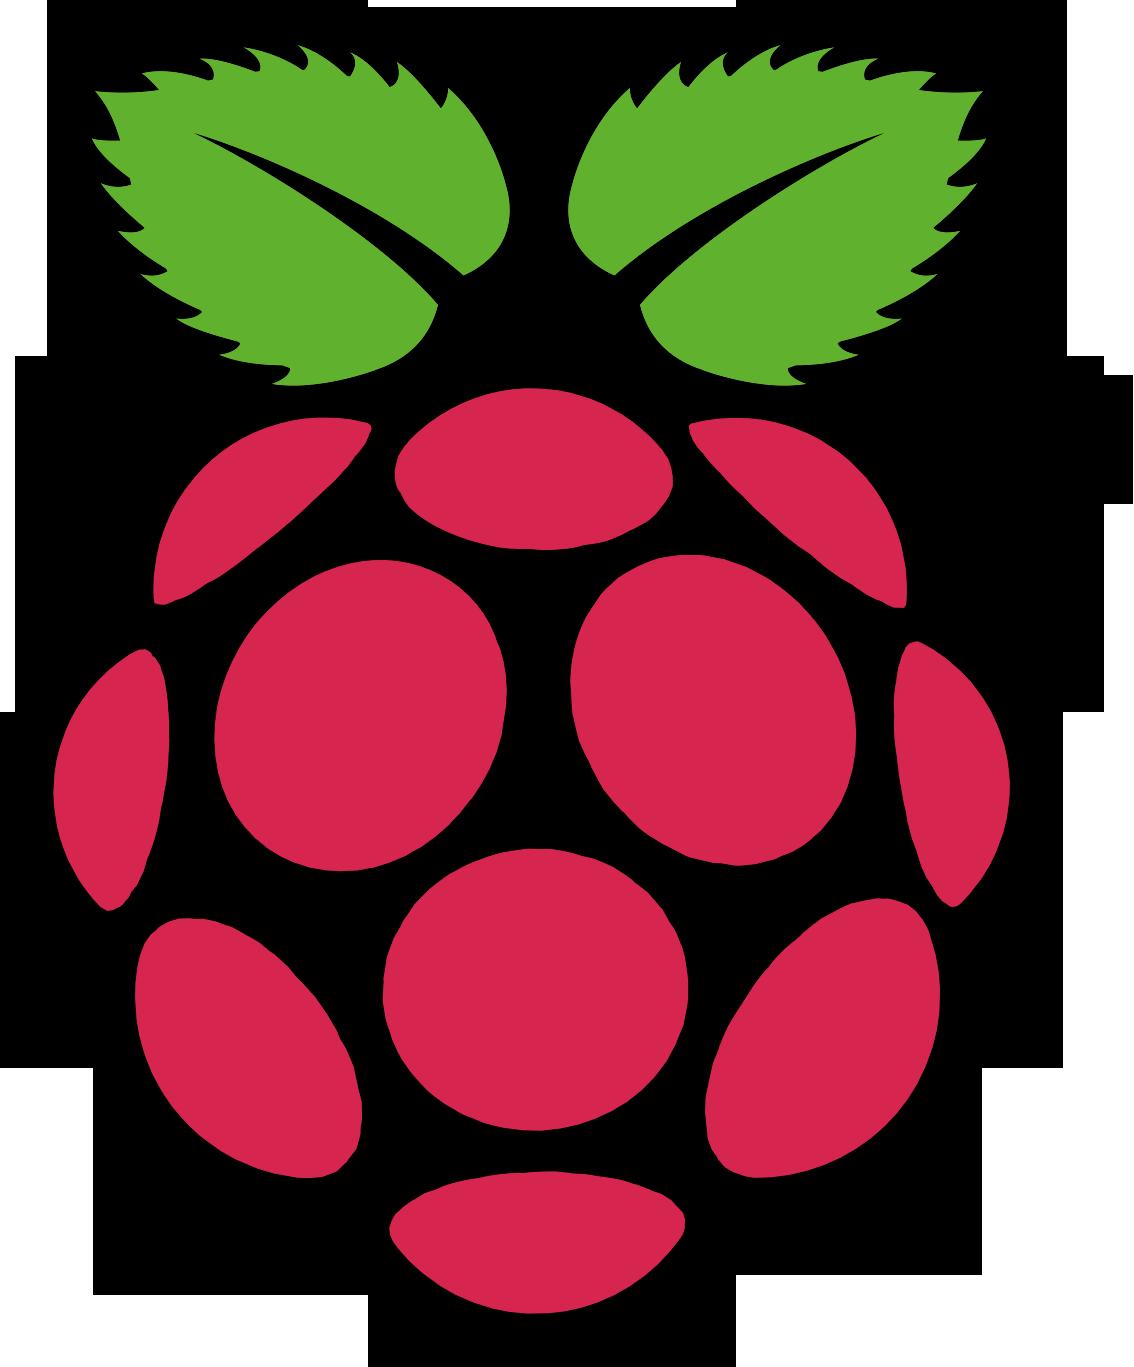 Raspberry Pi.png - Raspberry Pi PNG